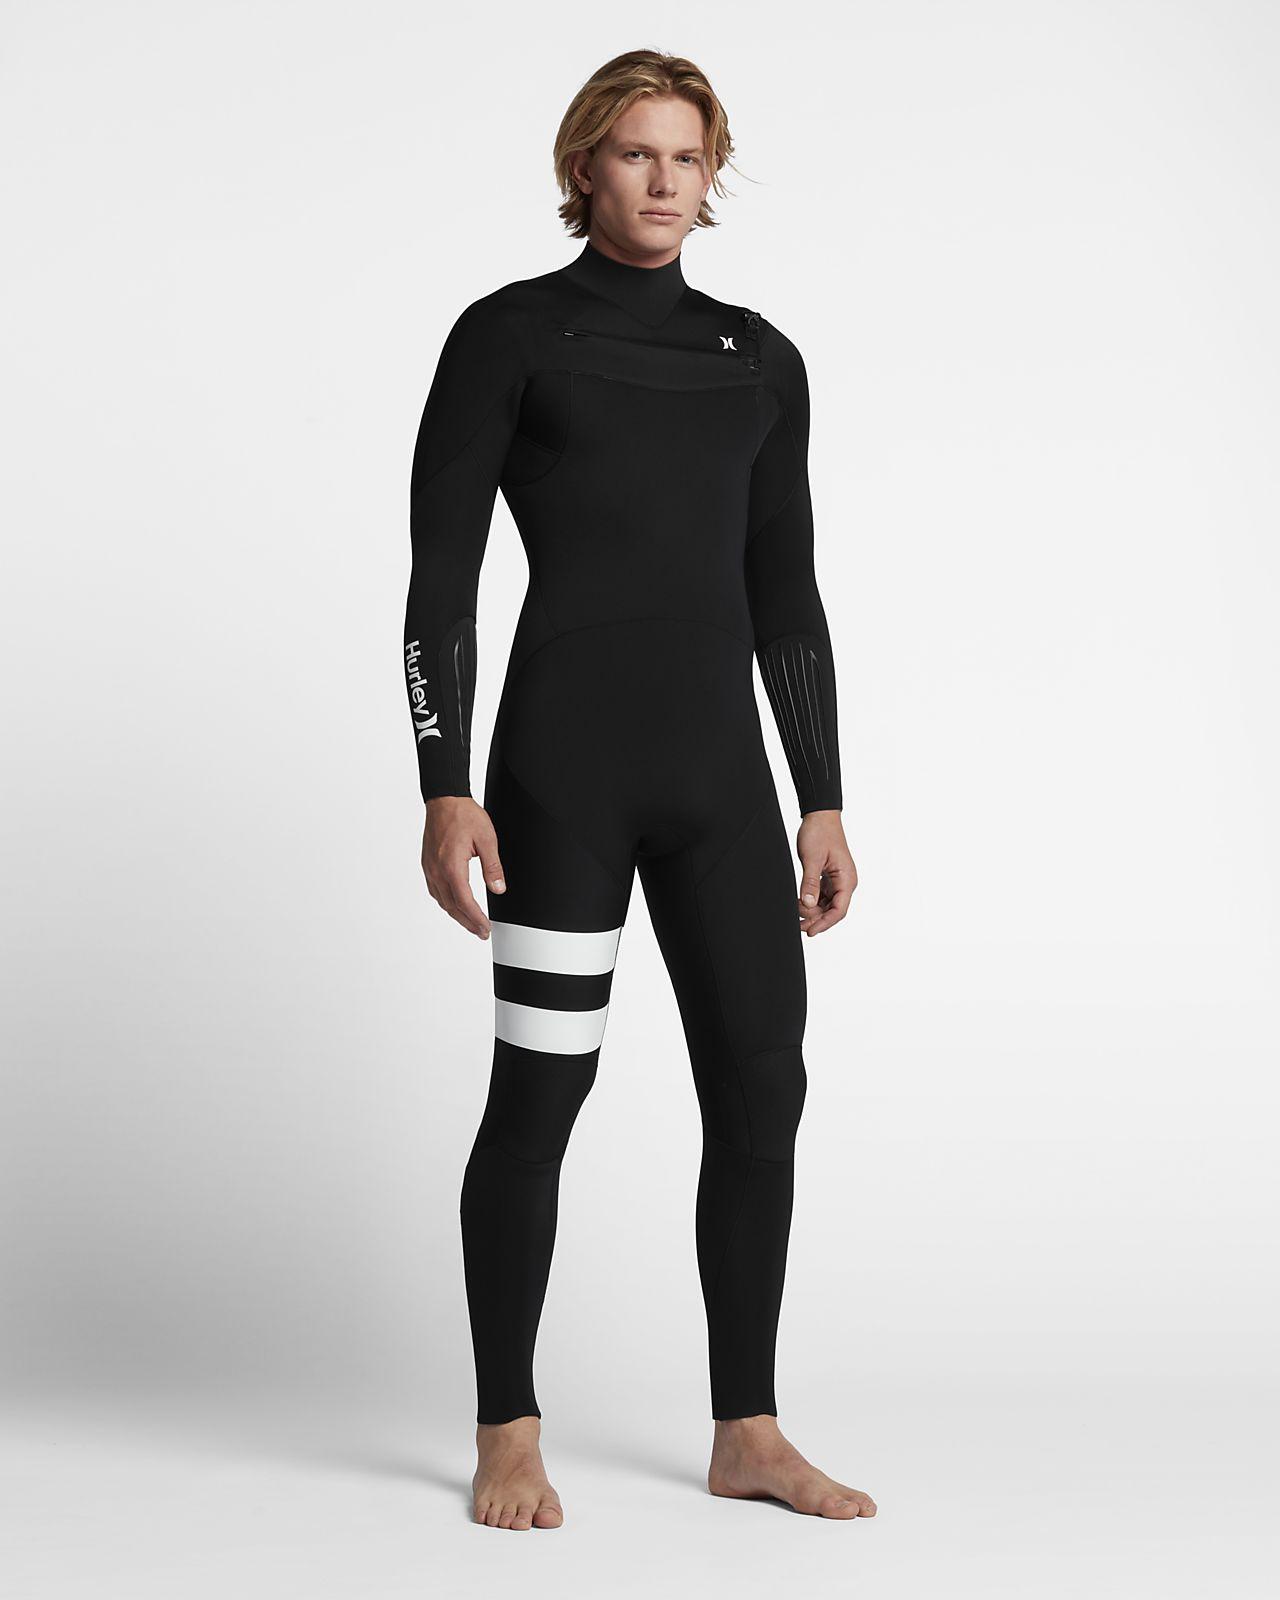 Fato de surf Hurley Advantage Elite 3/3mm Fullsuit para homem